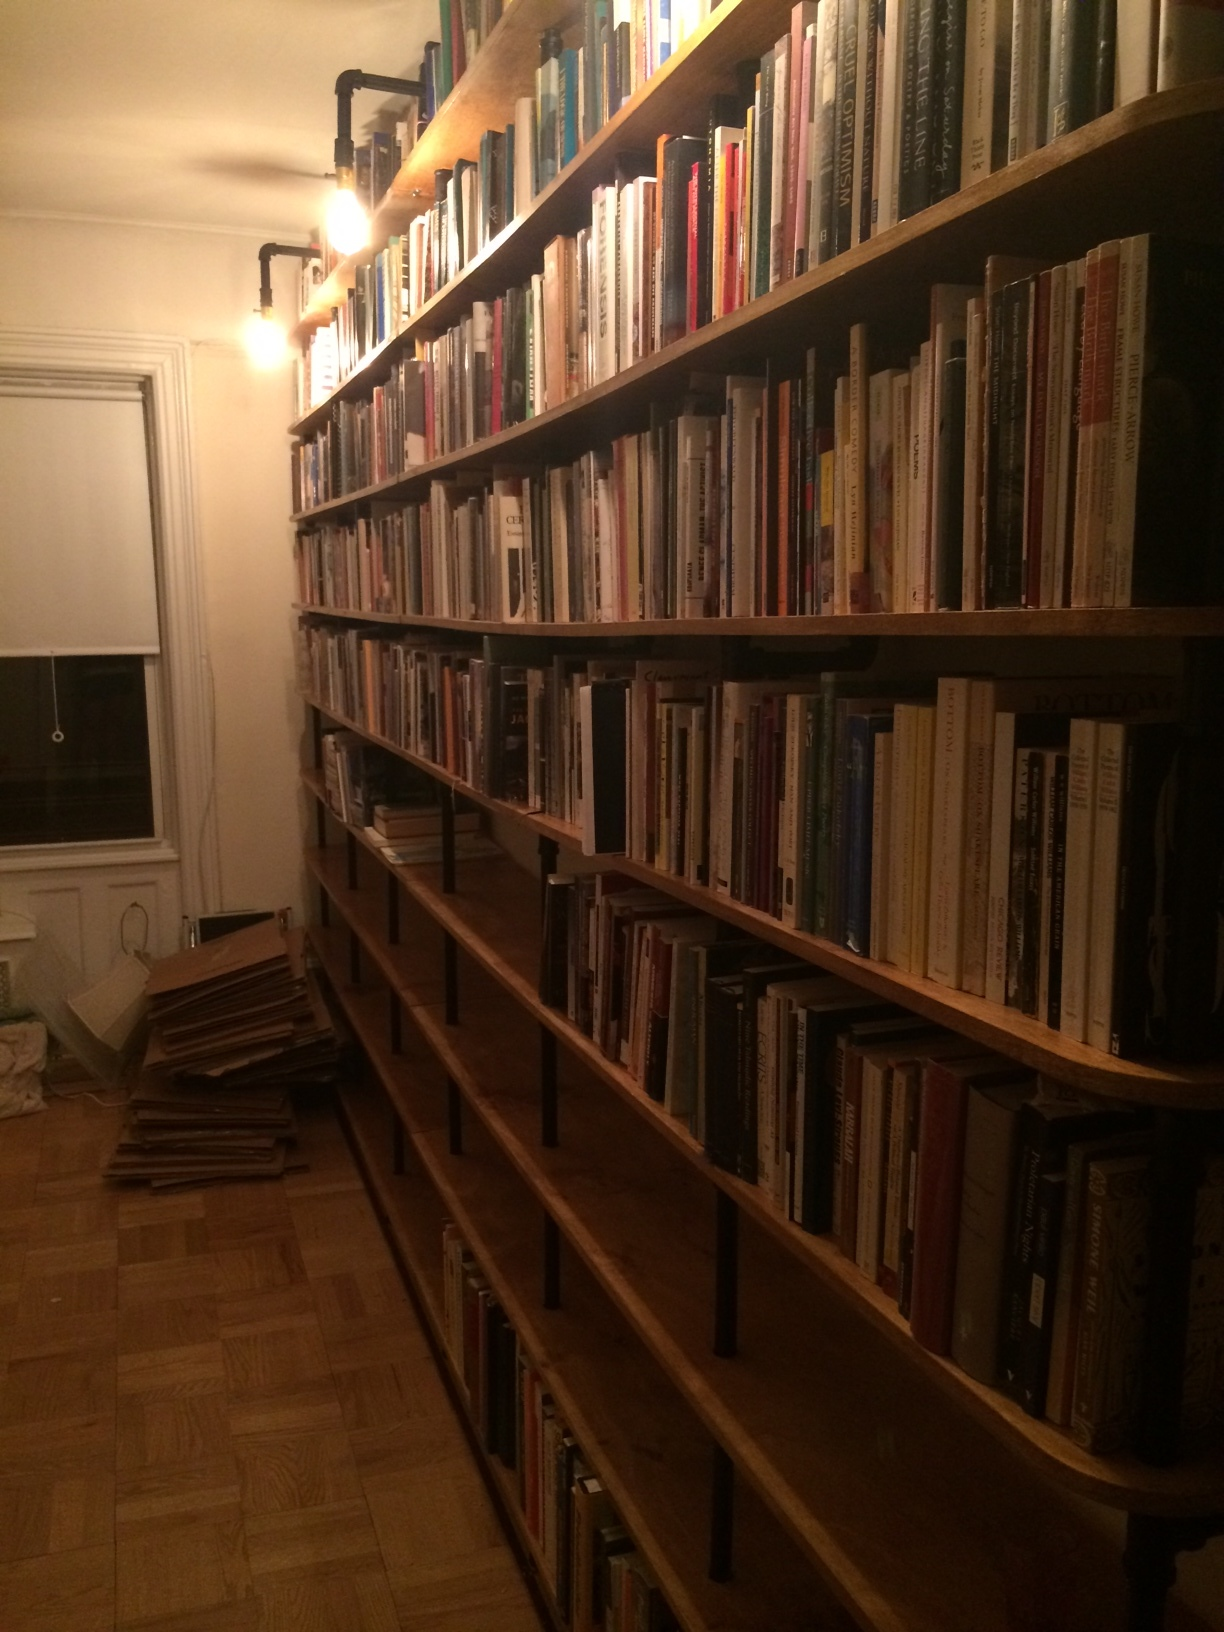 Donovan-Lasky Shelves 2.JPG